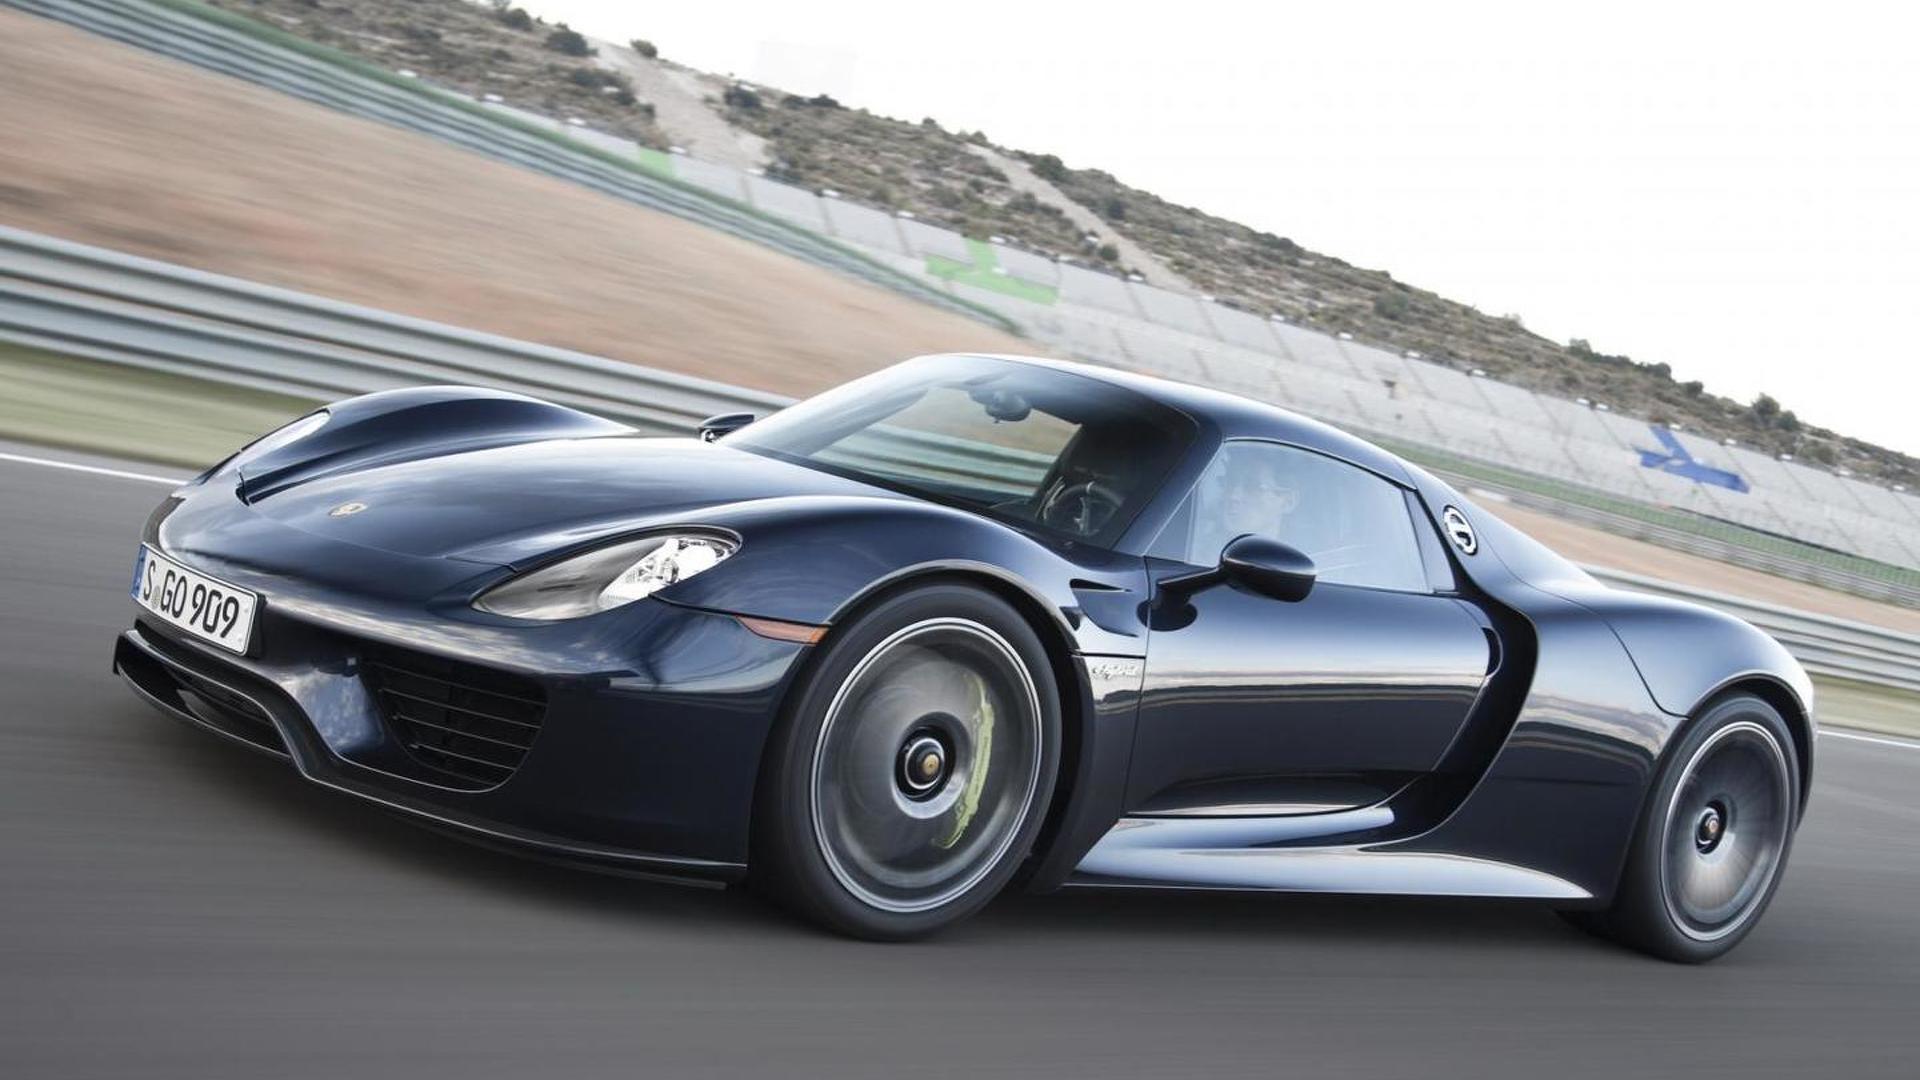 2013-434876-2014-porsche-918-spyder-us-spec1 Amazing Porsche 918 Spyder sold Out Cars Trend